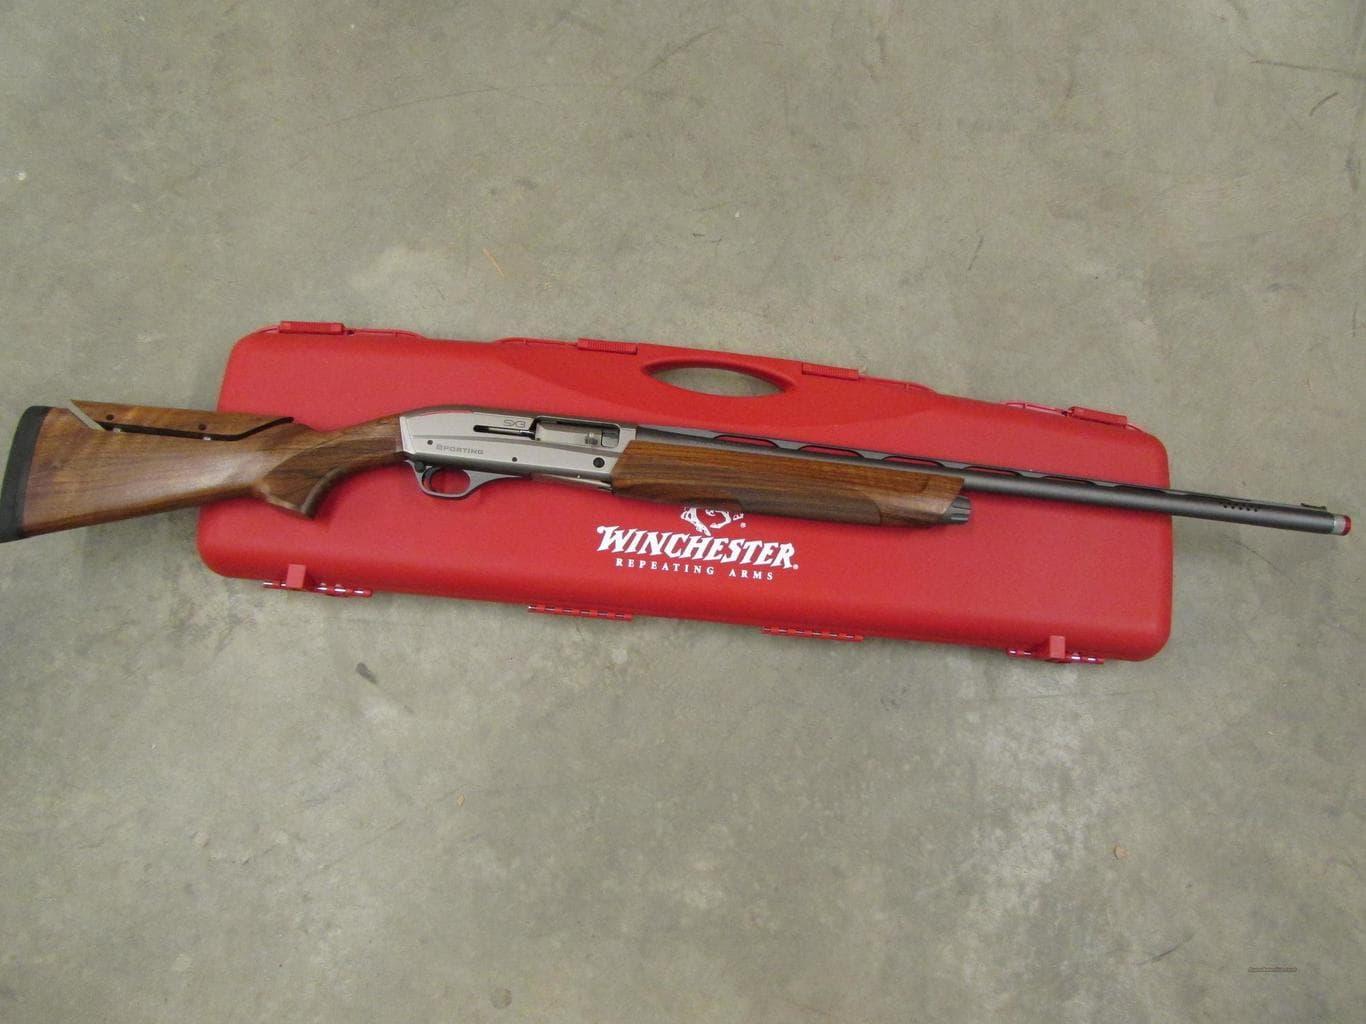 Winchester sxr / sx-ar винтовка — характеристики, фото, ттх